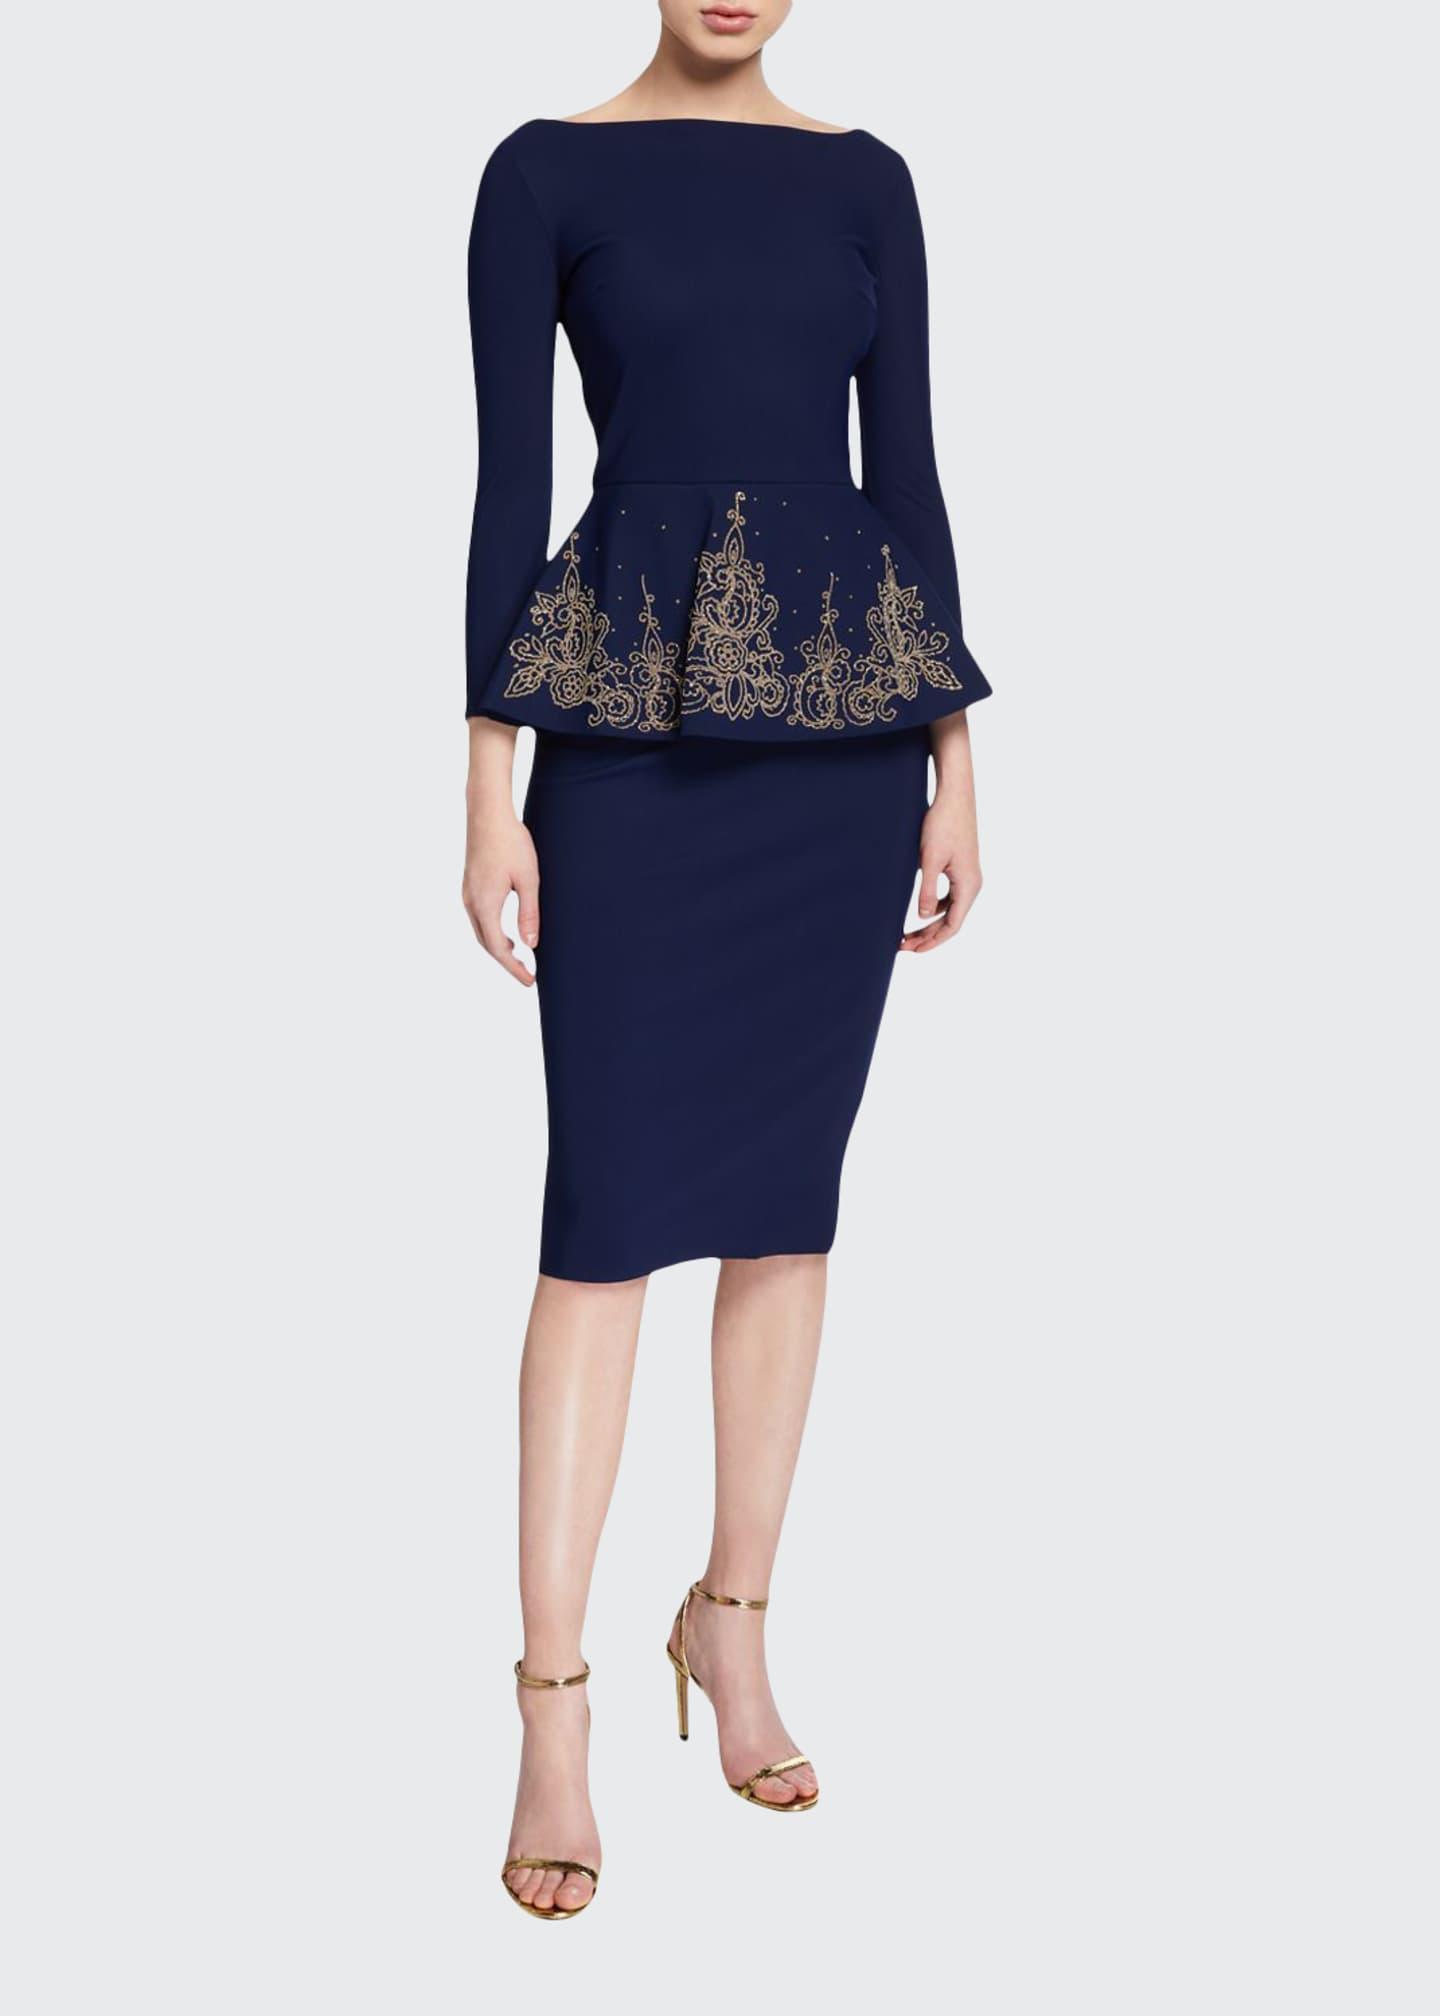 Chiara Boni La Petite Robe Bateau-Neck 3/4-Sleeve Embroidered